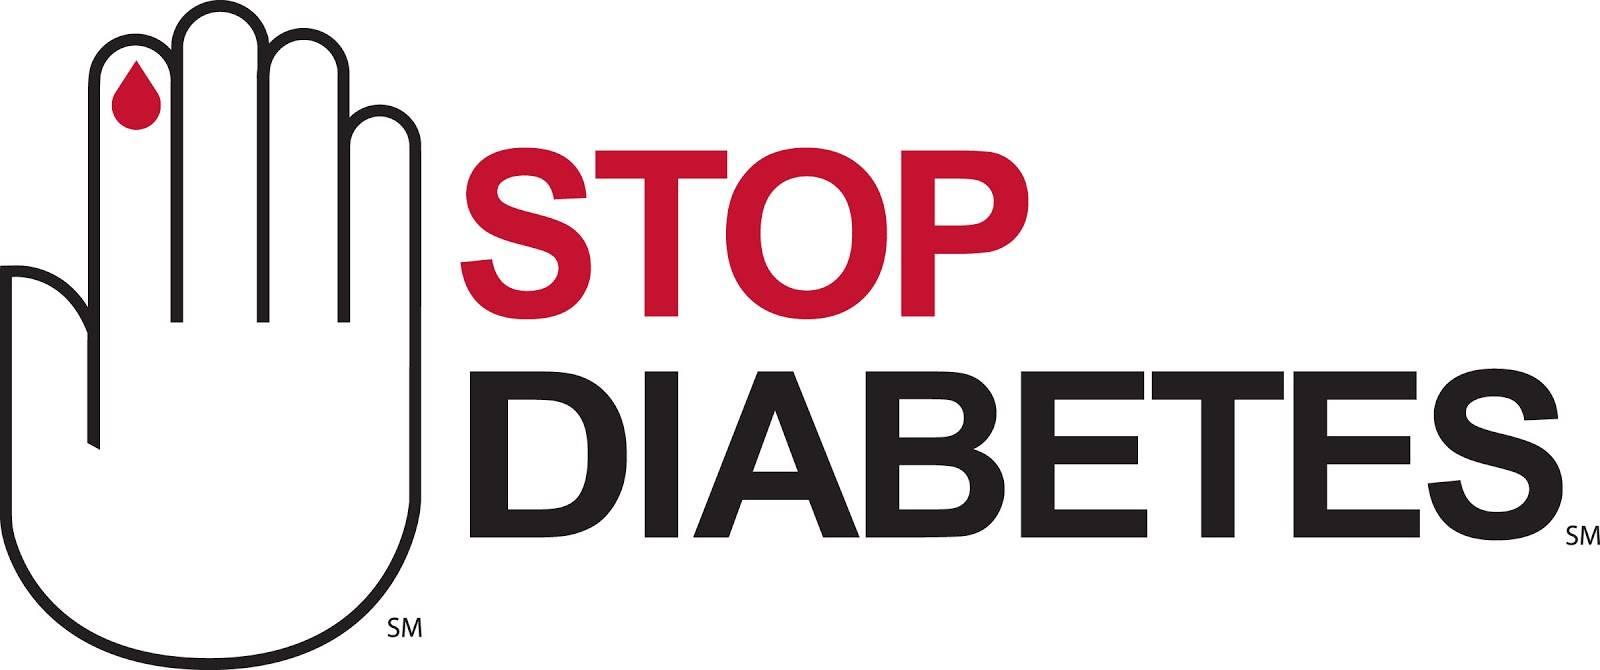 Профилактика сахарного диабета 2 типа: памятка